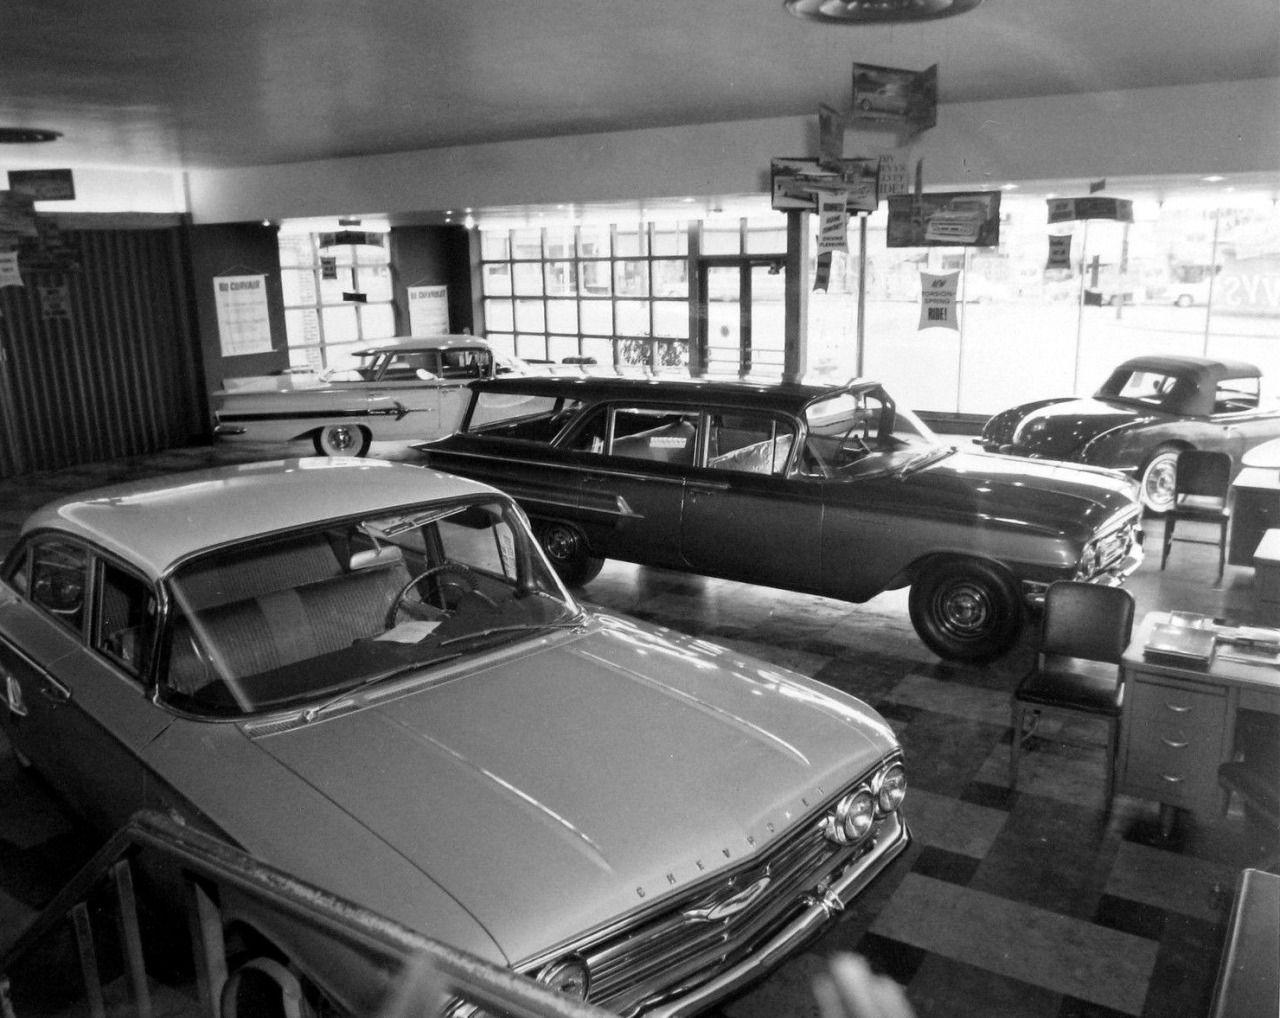 Chevy showroom… 1960(good stuff here) Classic cars